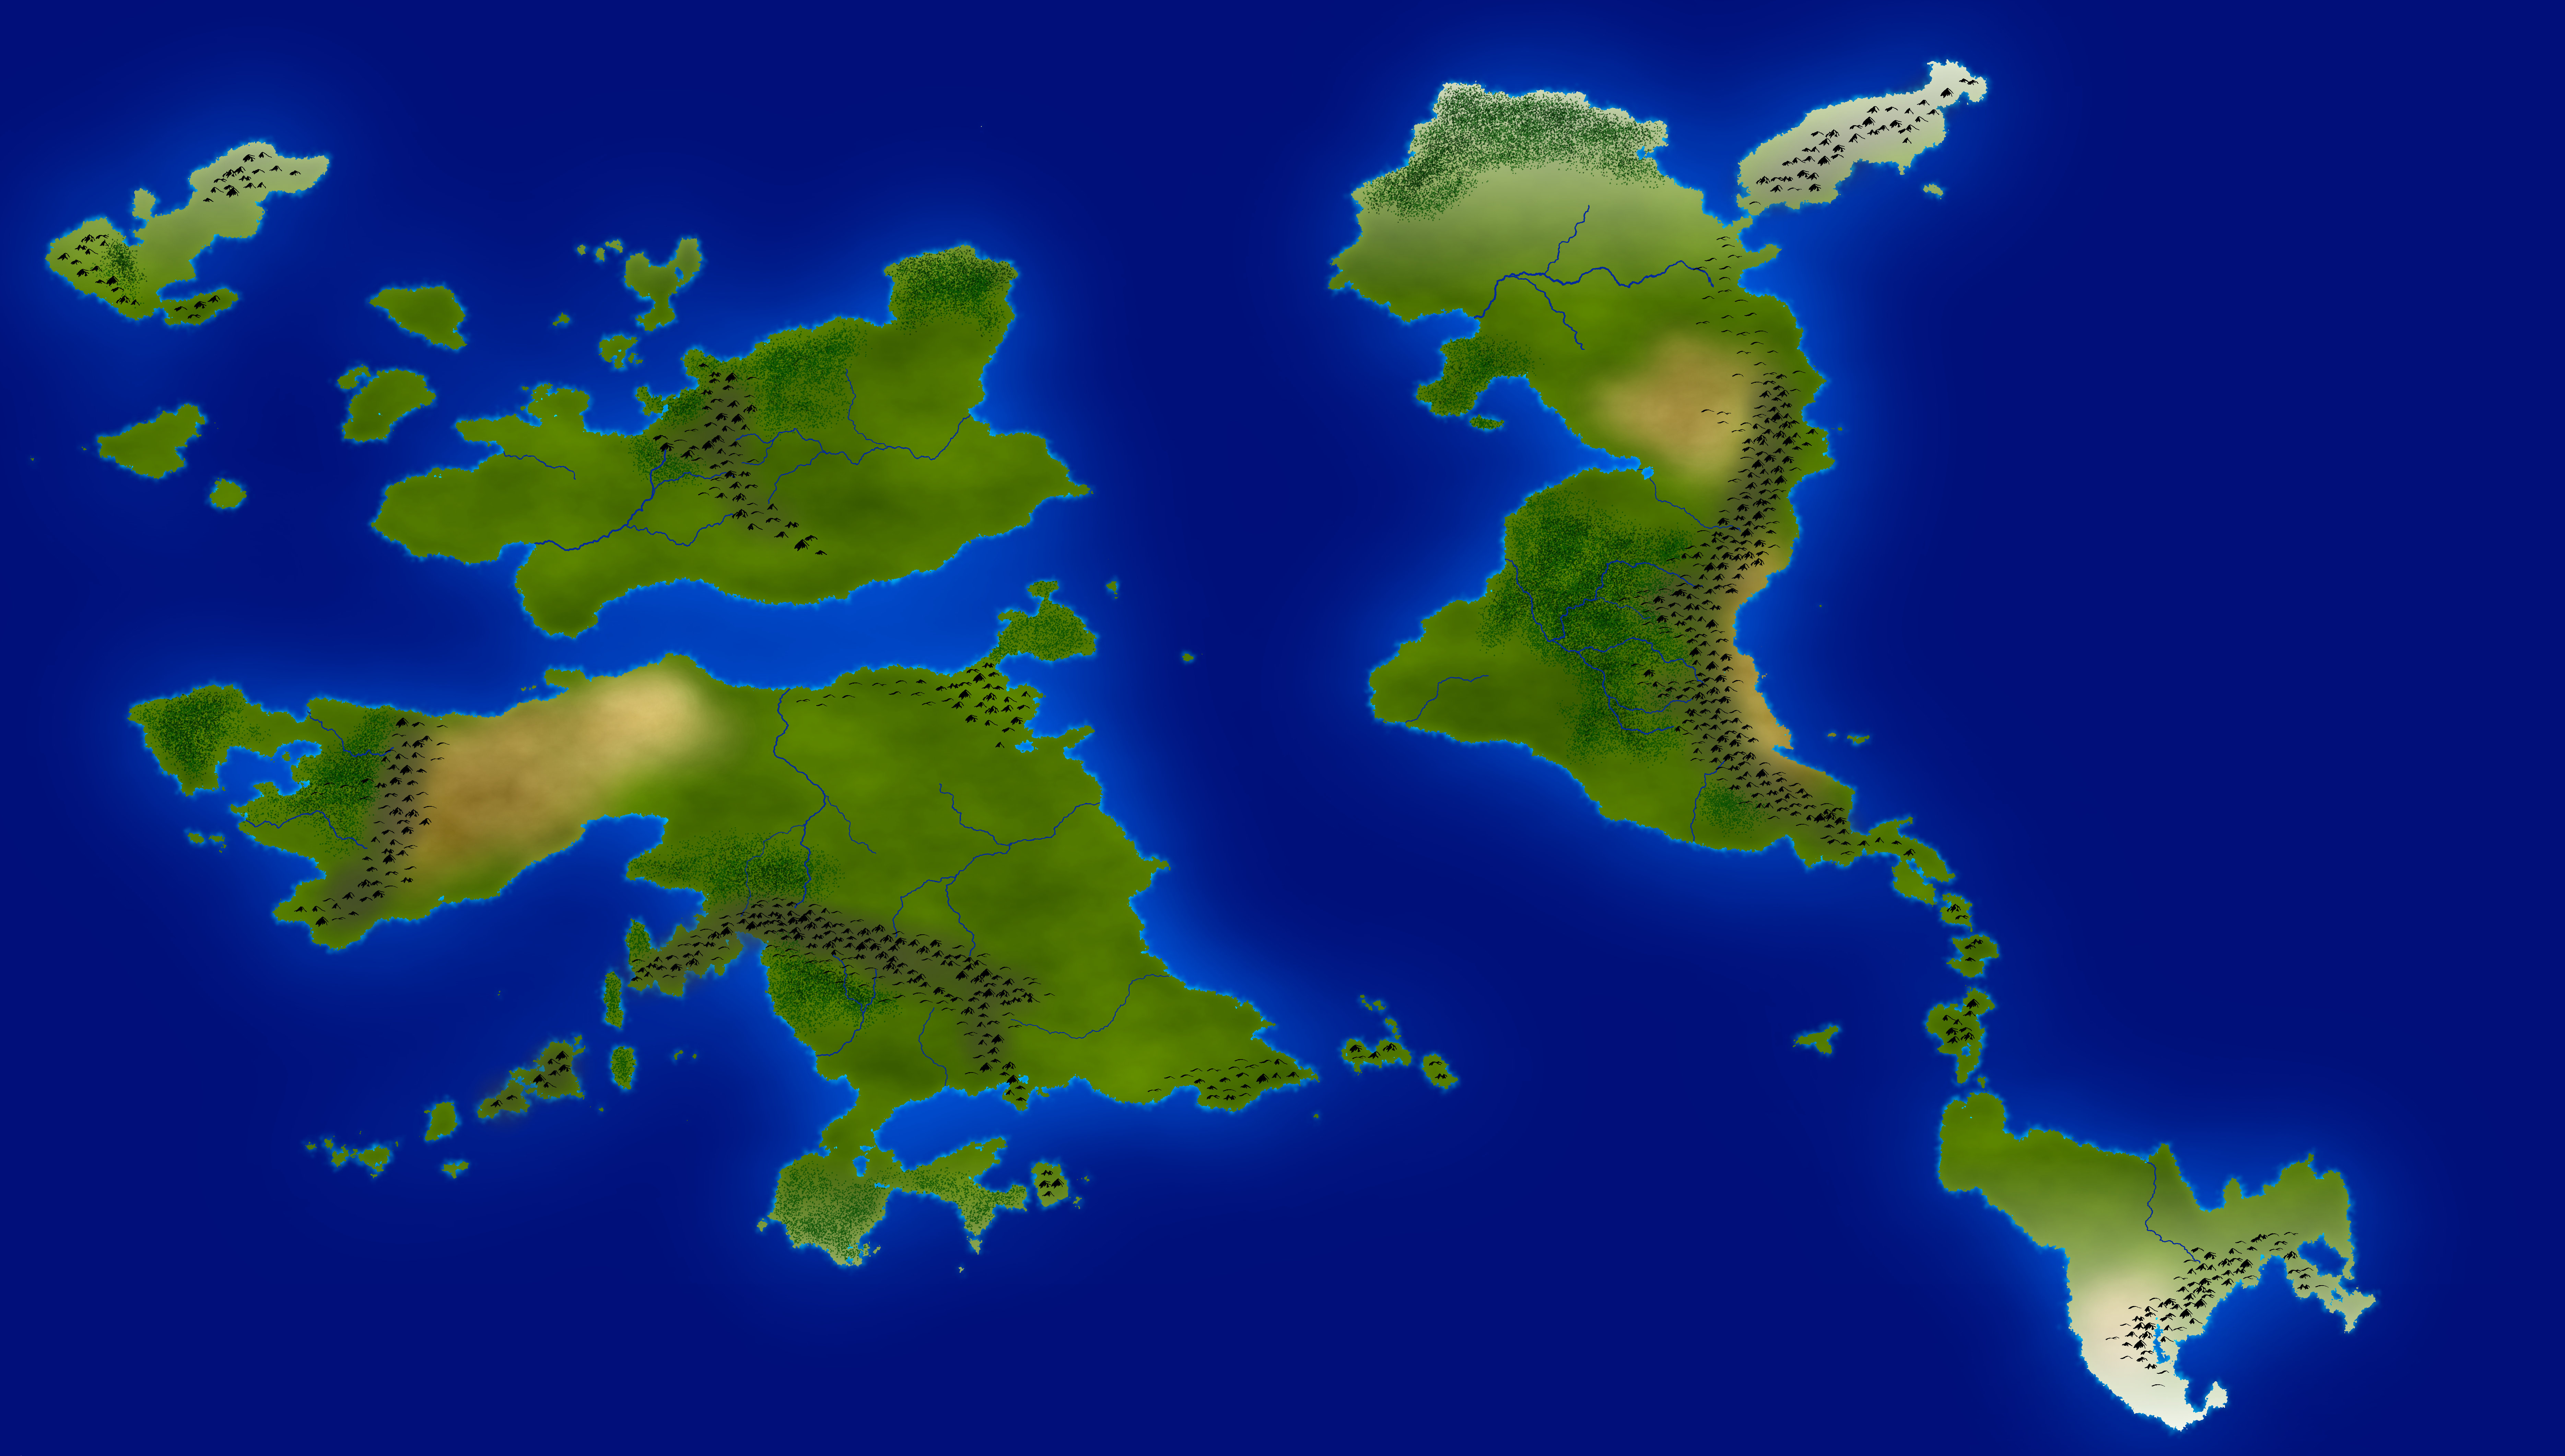 Random World Map.Worldbuilding In Gimp Ryan Anderson